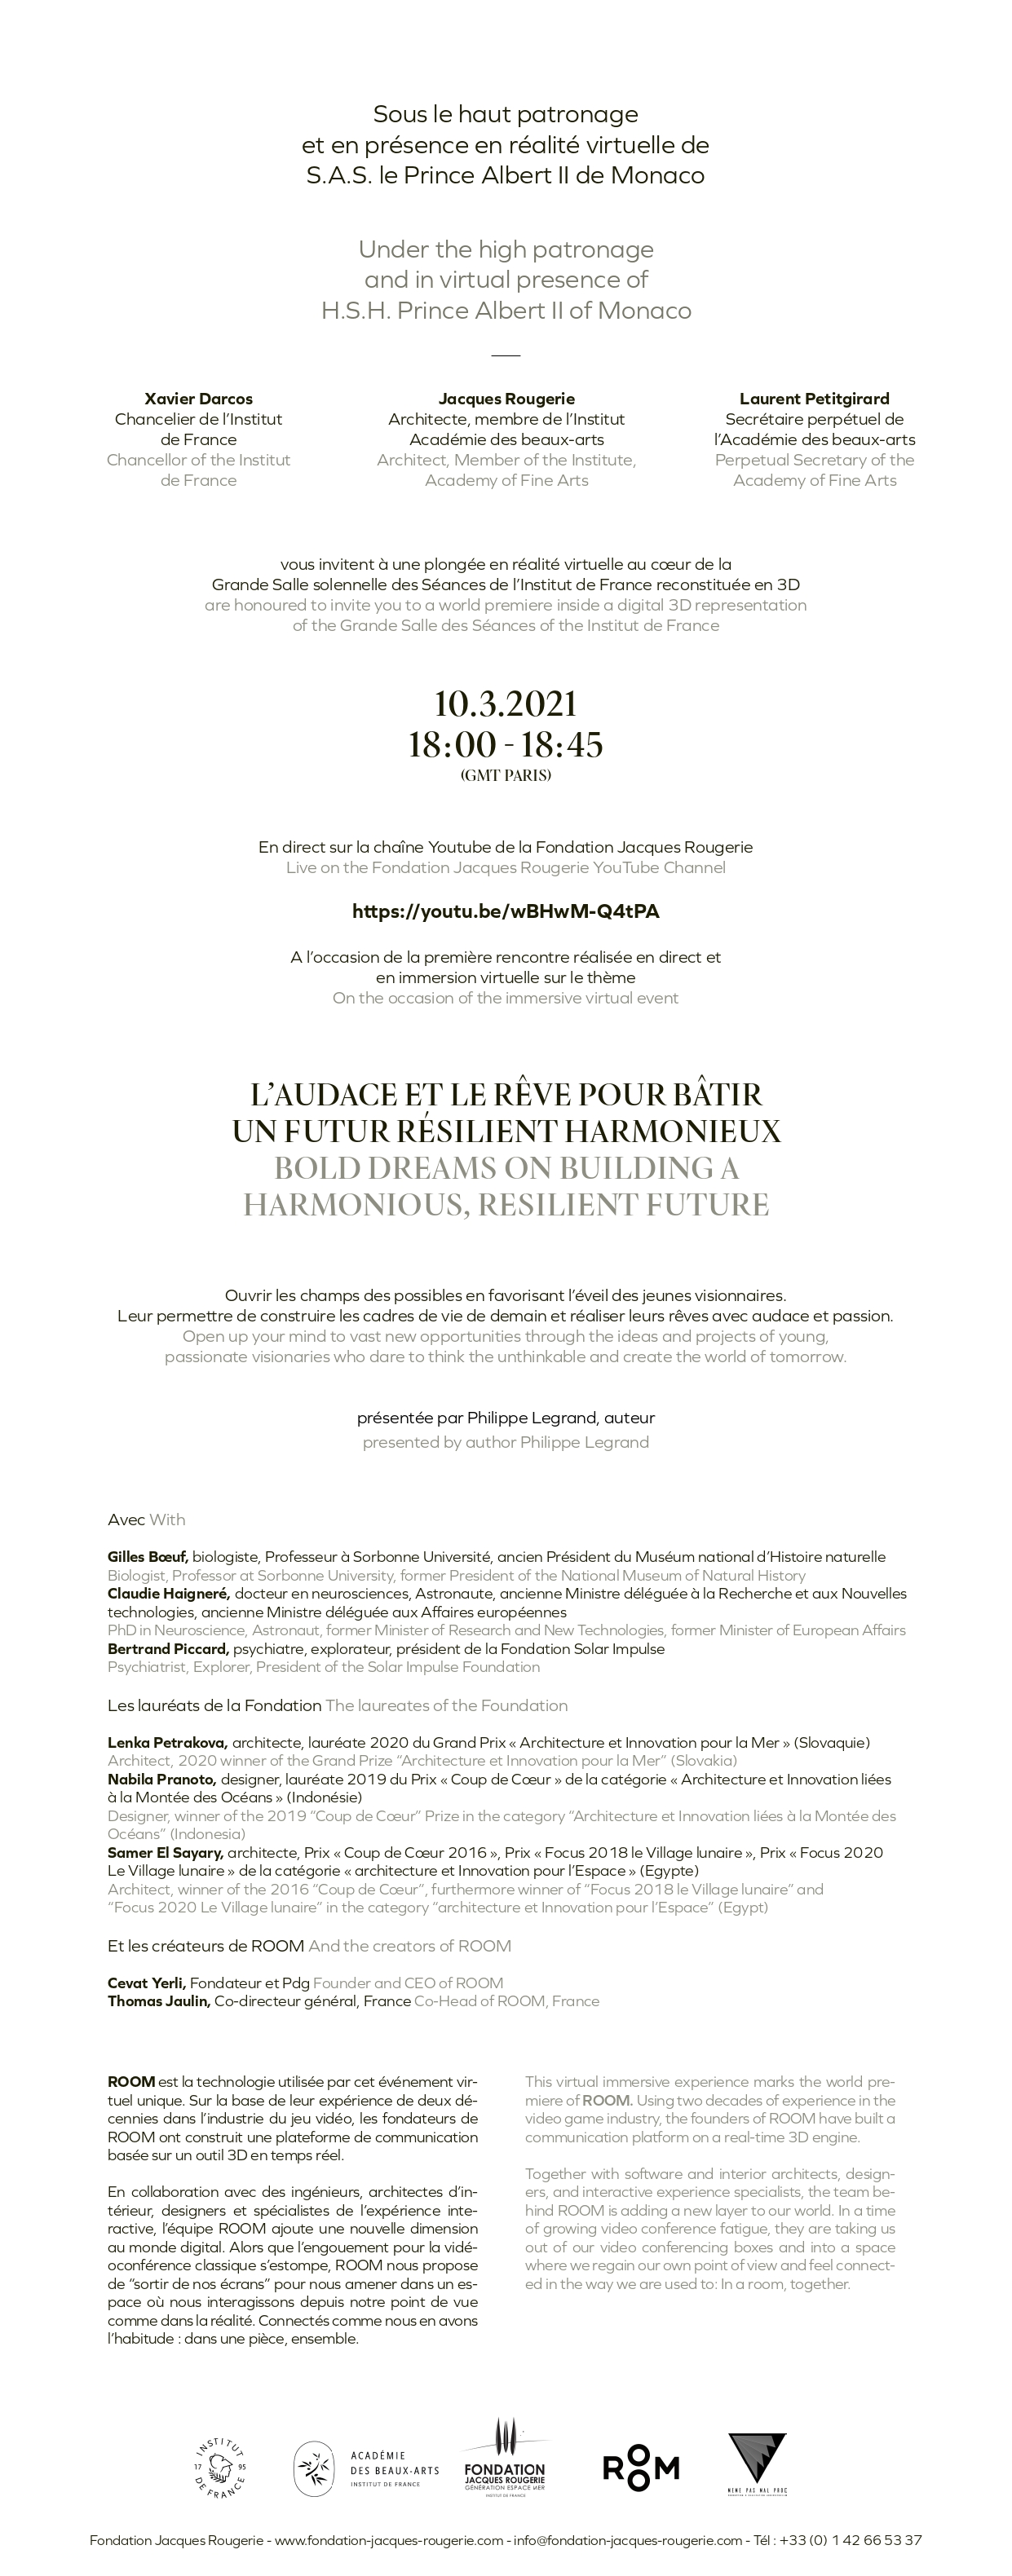 INVITATIONAUDACEETREVEPOURBATIRUNFUTURRESILIENTHARMONIEUX_page-0002